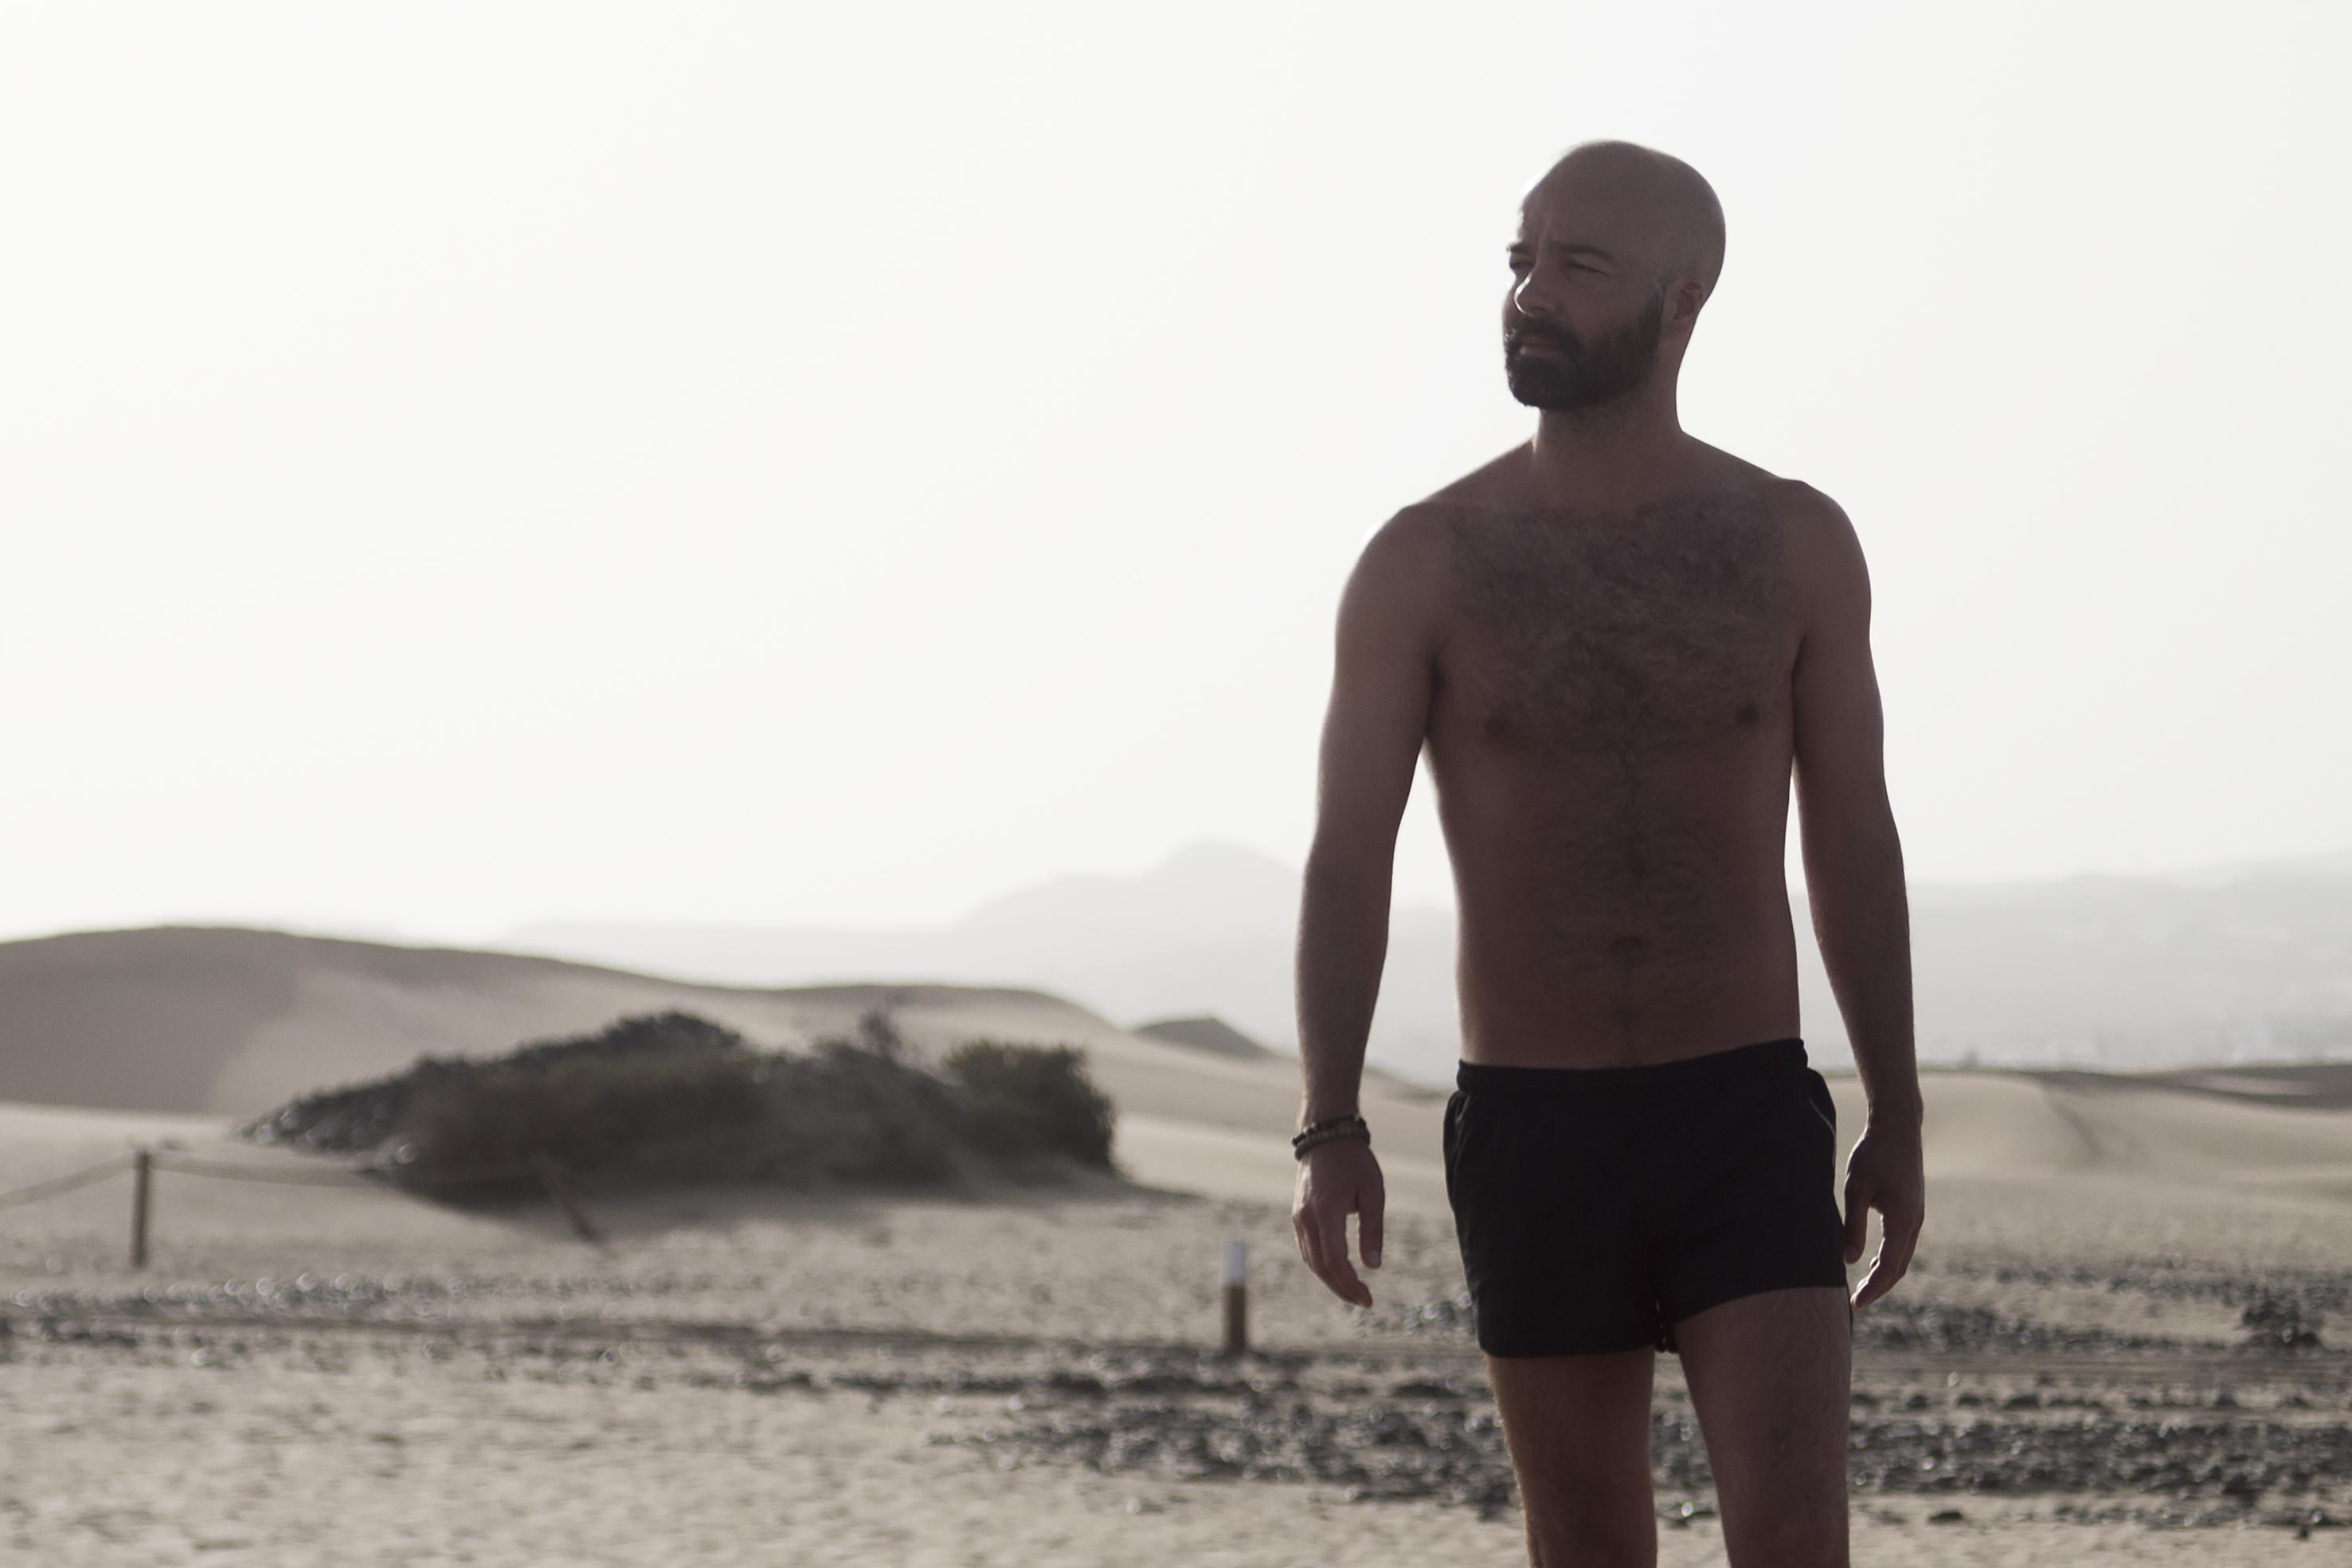 CALIMA: Fotografía de desnudo. Fotógrafo: David Guillén